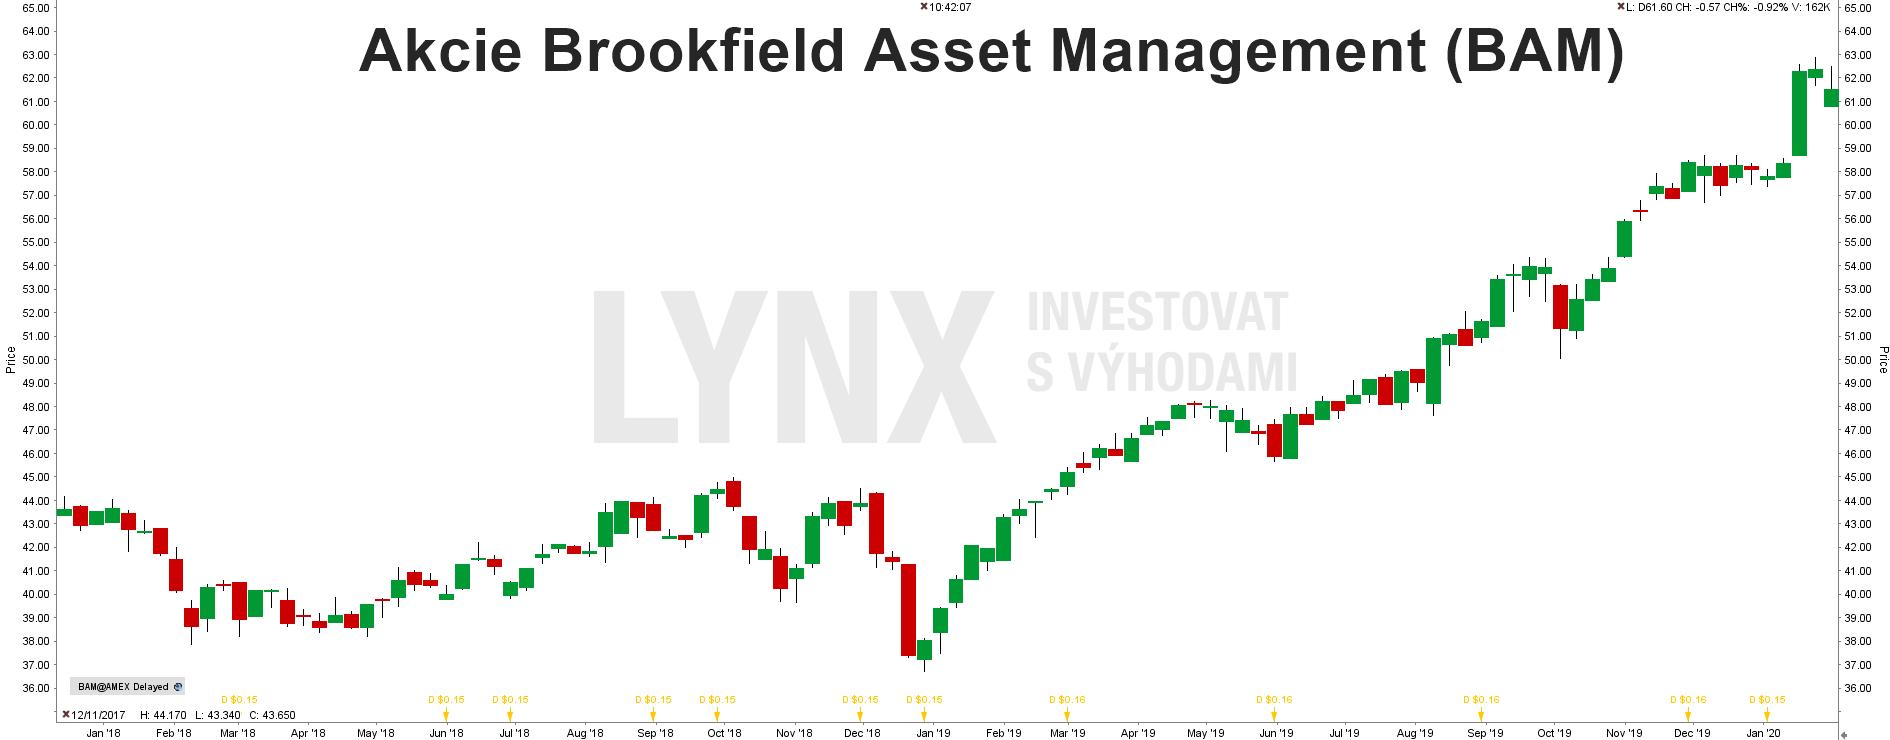 Akcie Brookfield Asset Management